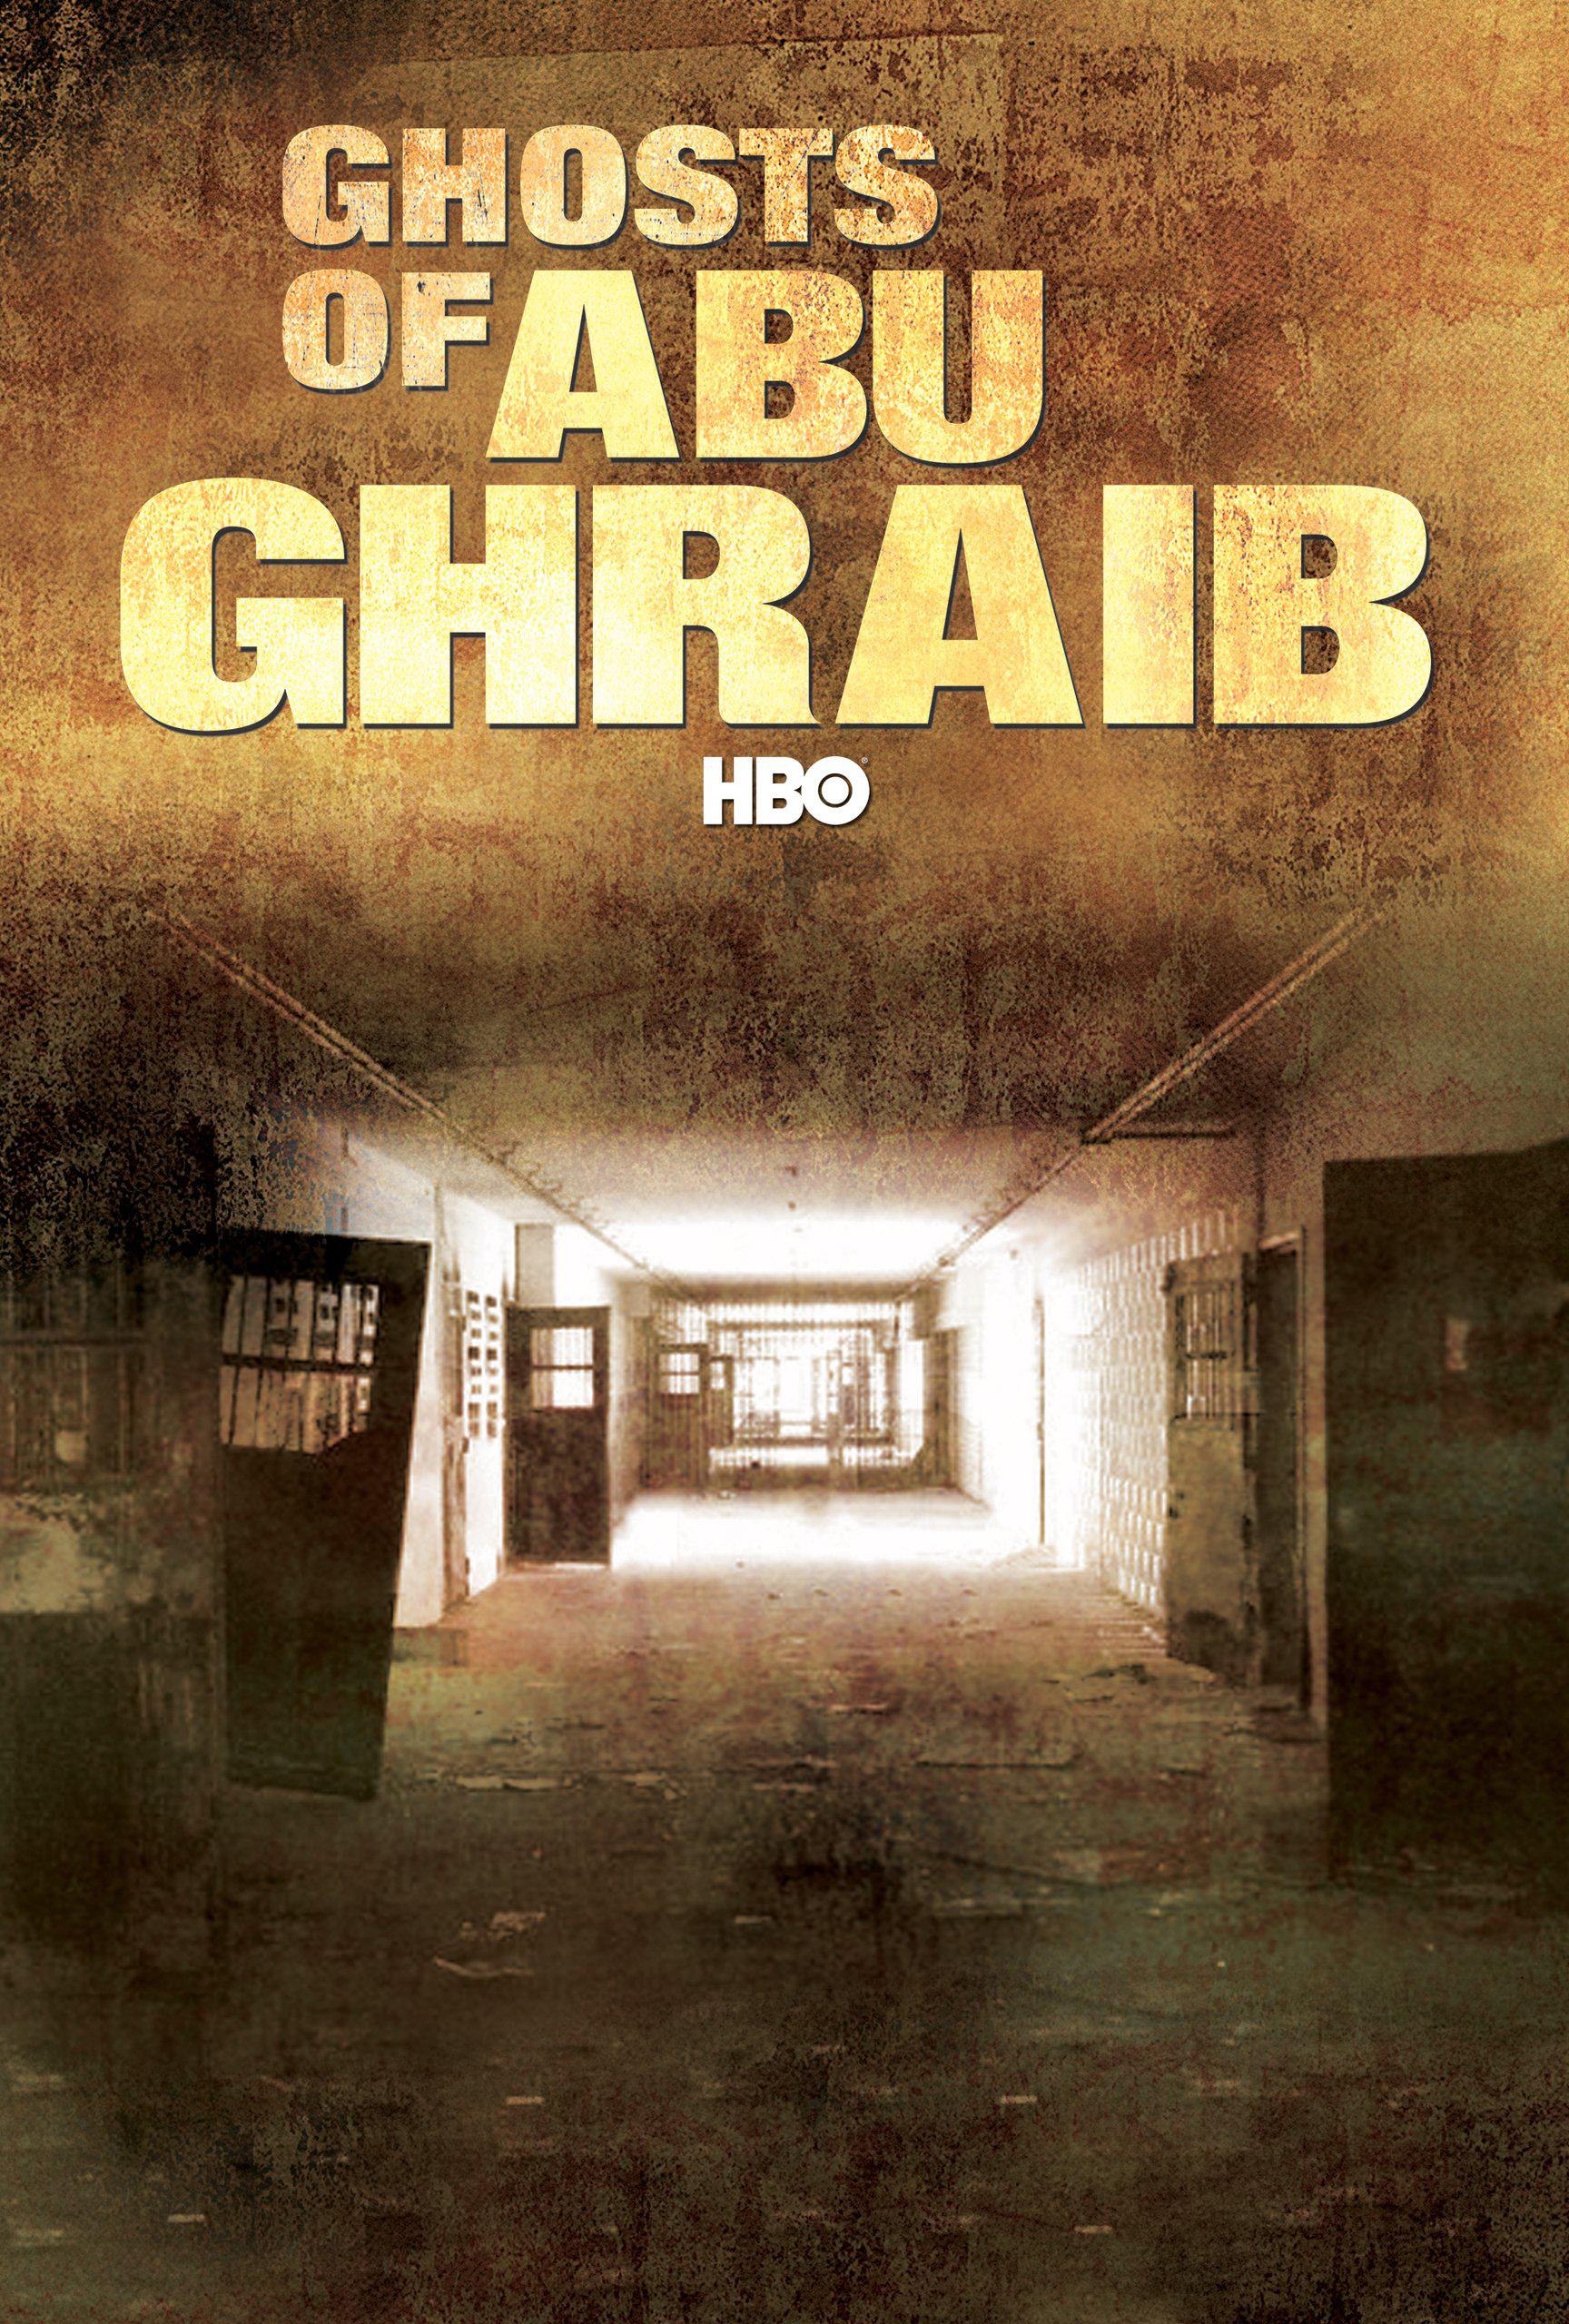 GHOSTS OF ABU GHRAIB  (2007)  EDITOR  PRIMTIME EMMY NOMINATION  SUNDANCE FILM FESTIVAL  HBO